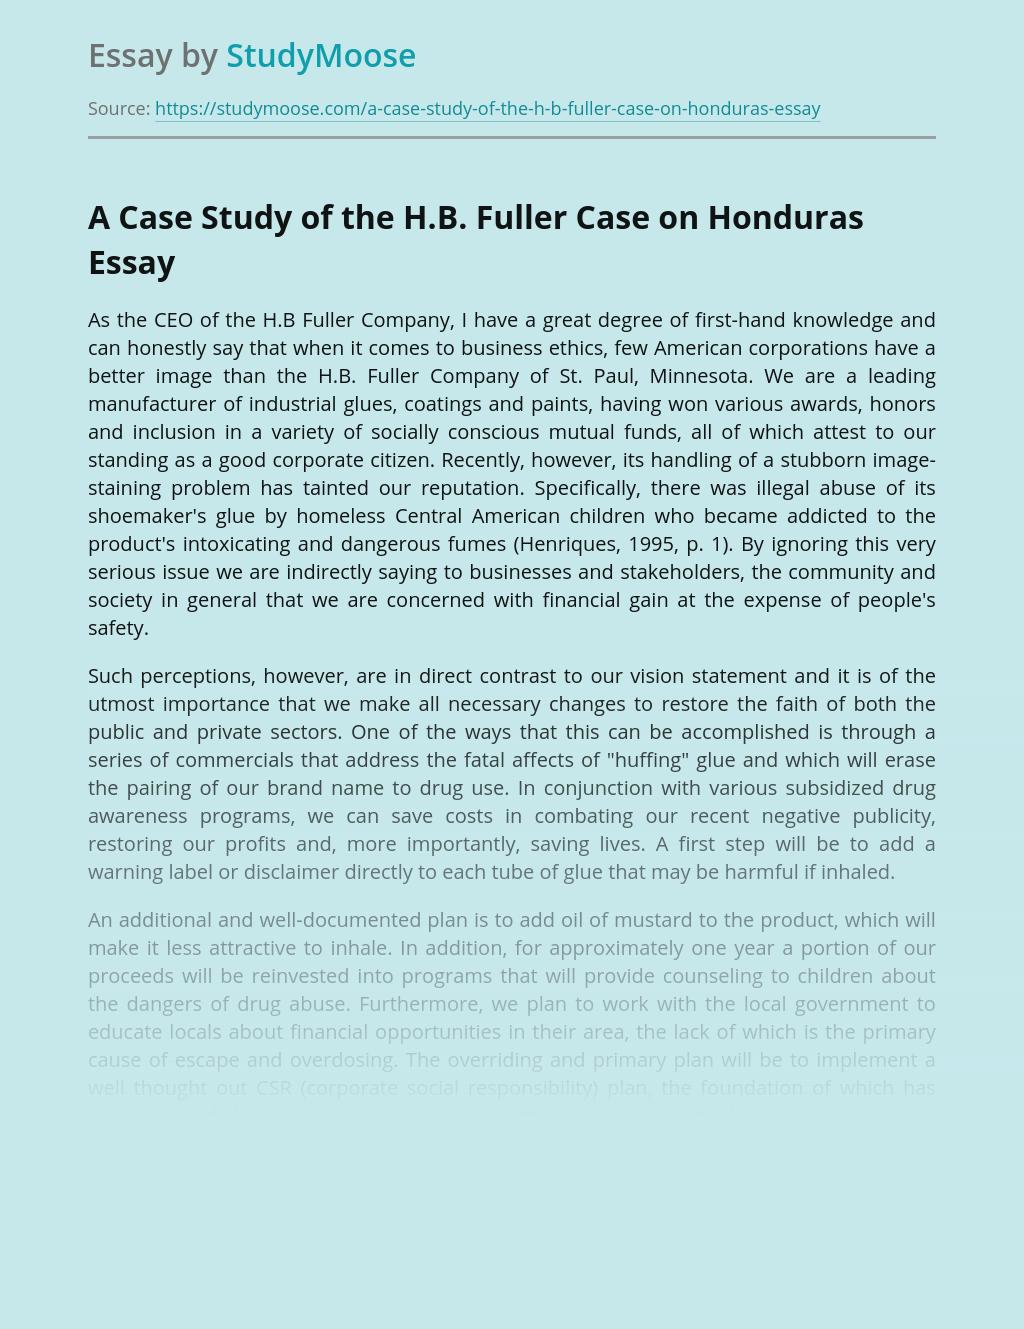 A Case Study of the H.B. Fuller Case on Honduras